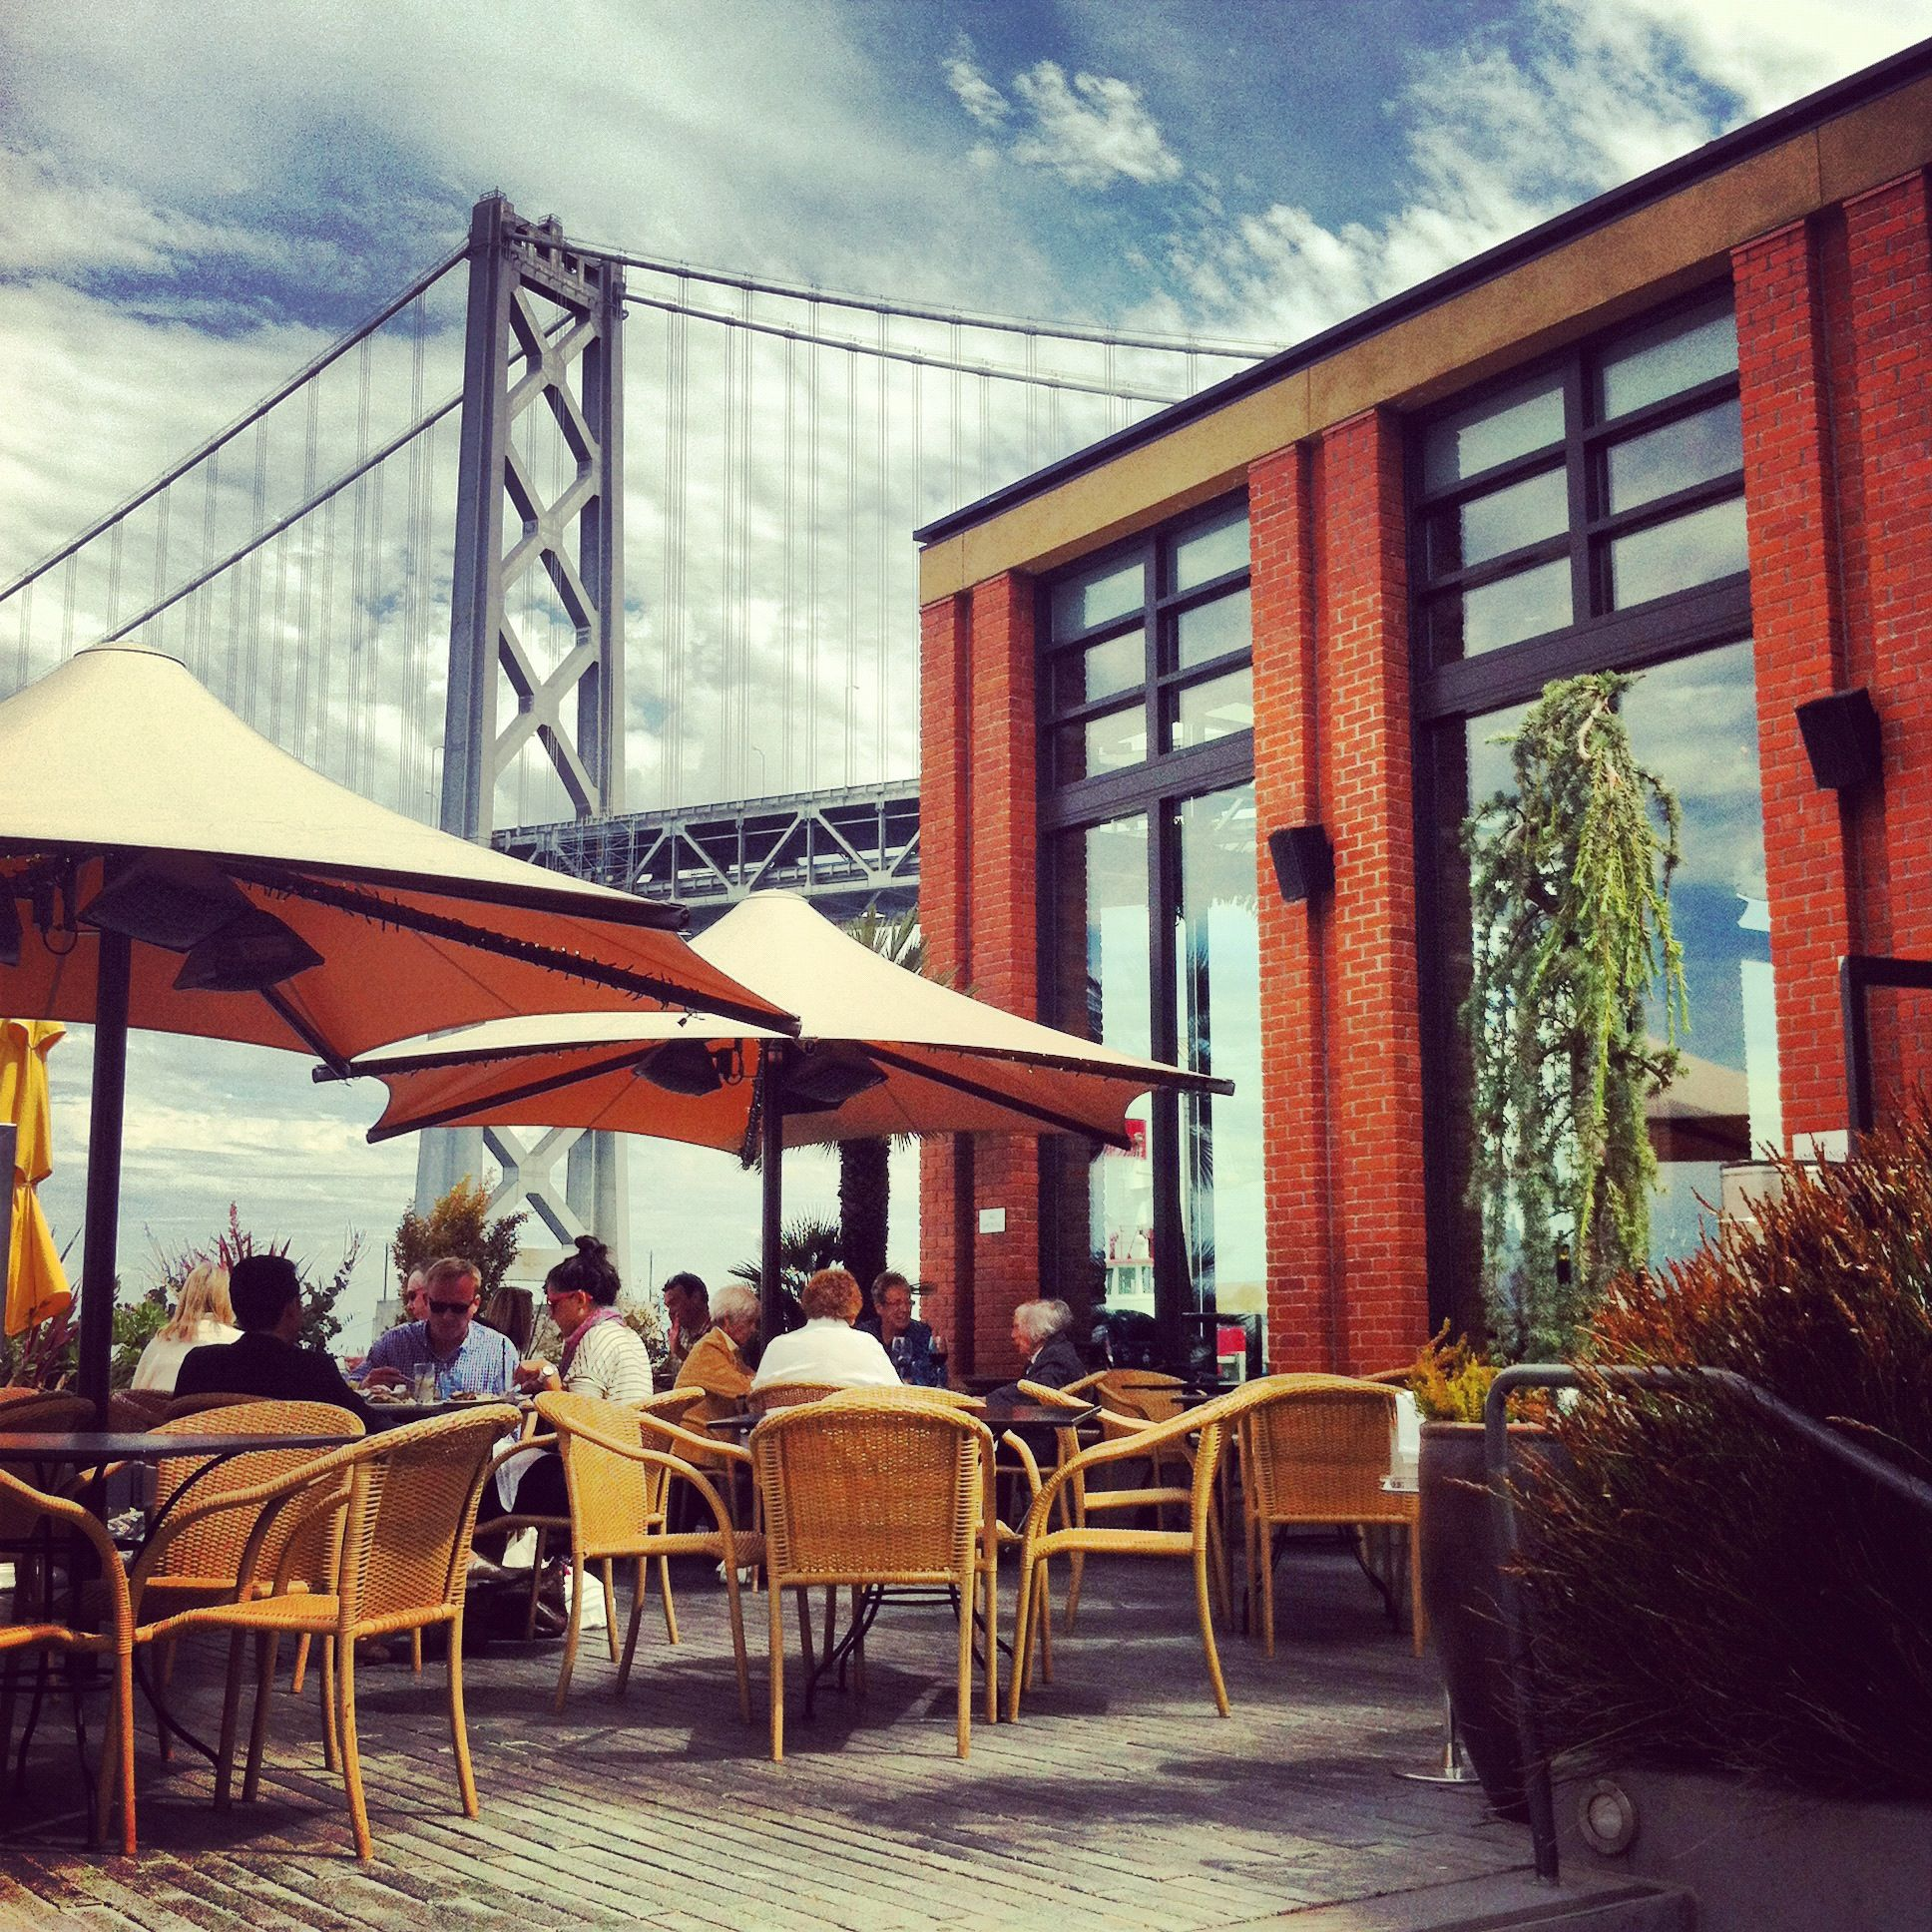 Waterbar Restaurant San Francisco CA One of